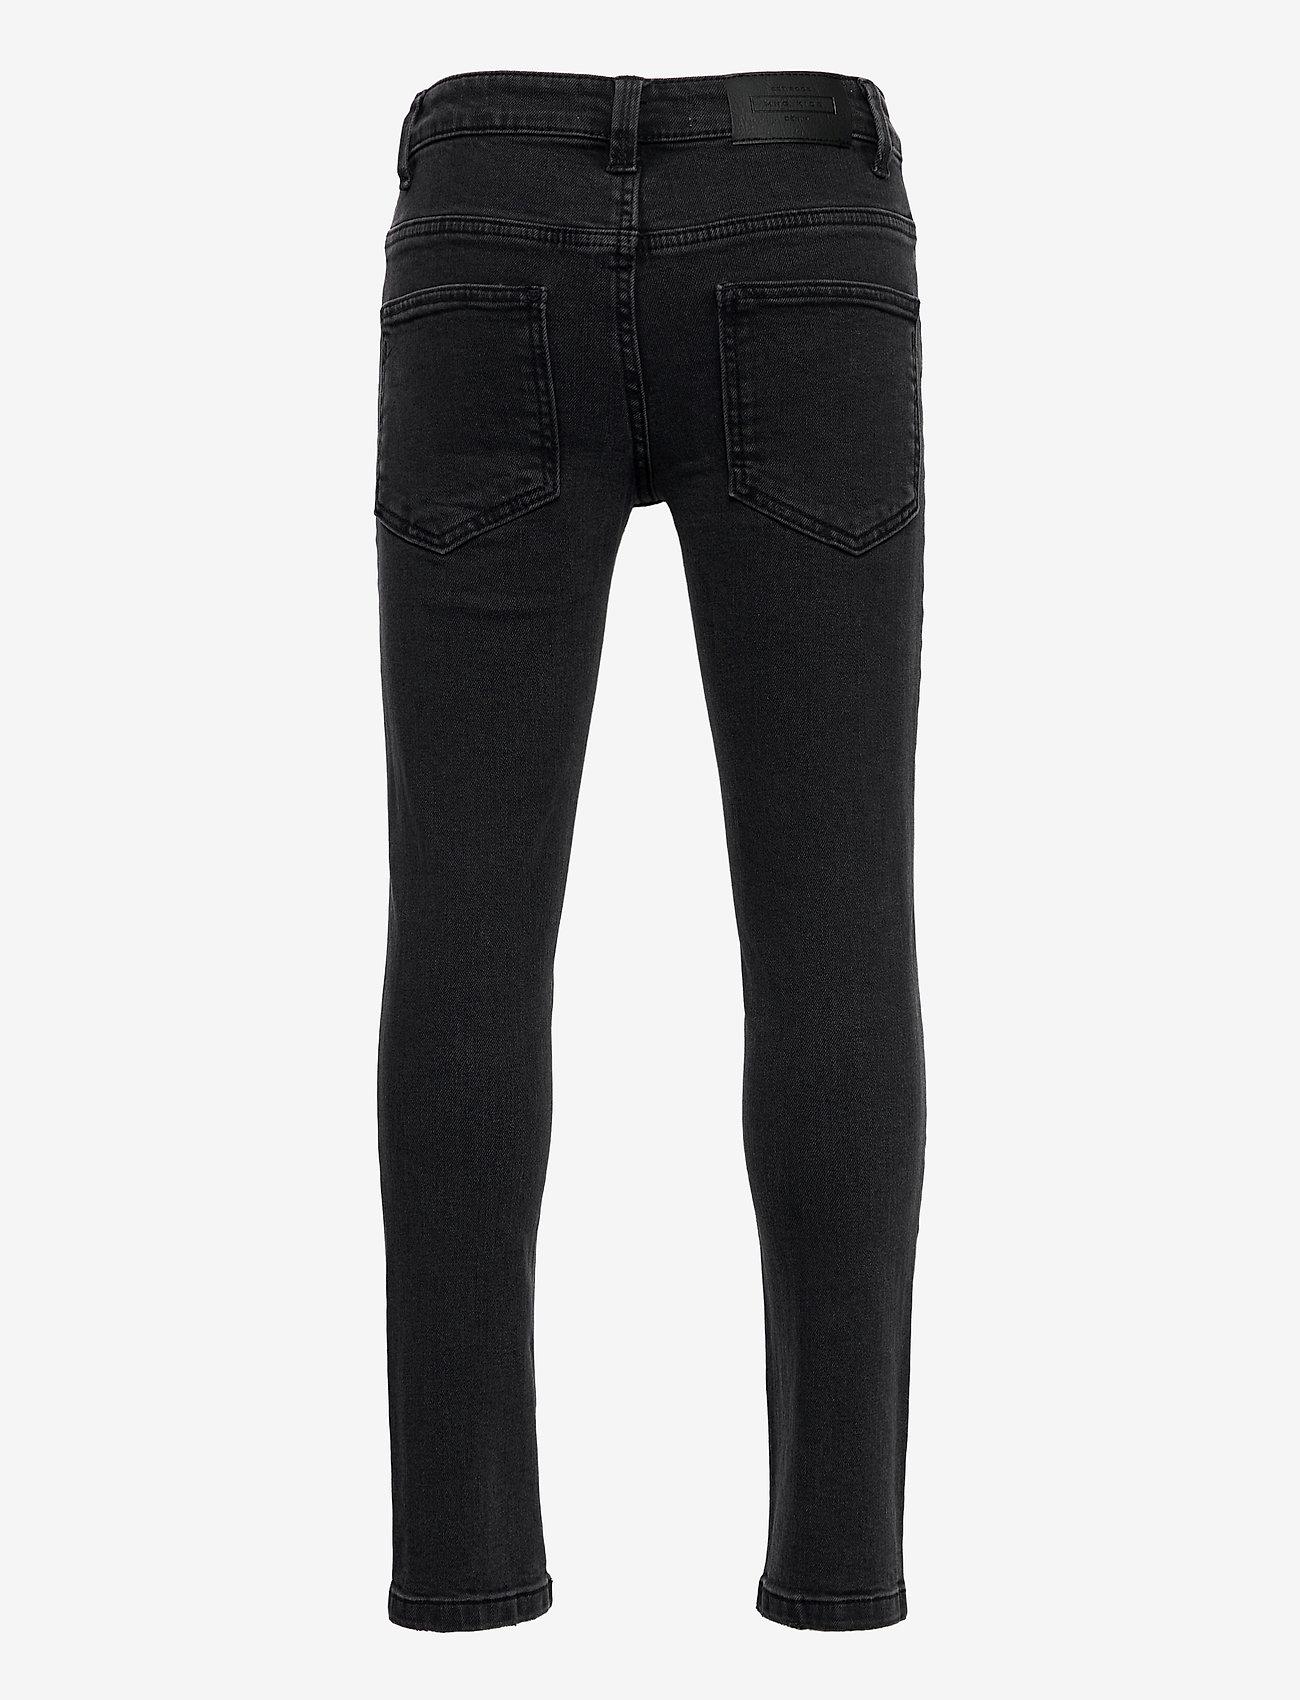 Mango - SLIM8 - jeans - open gray - 1